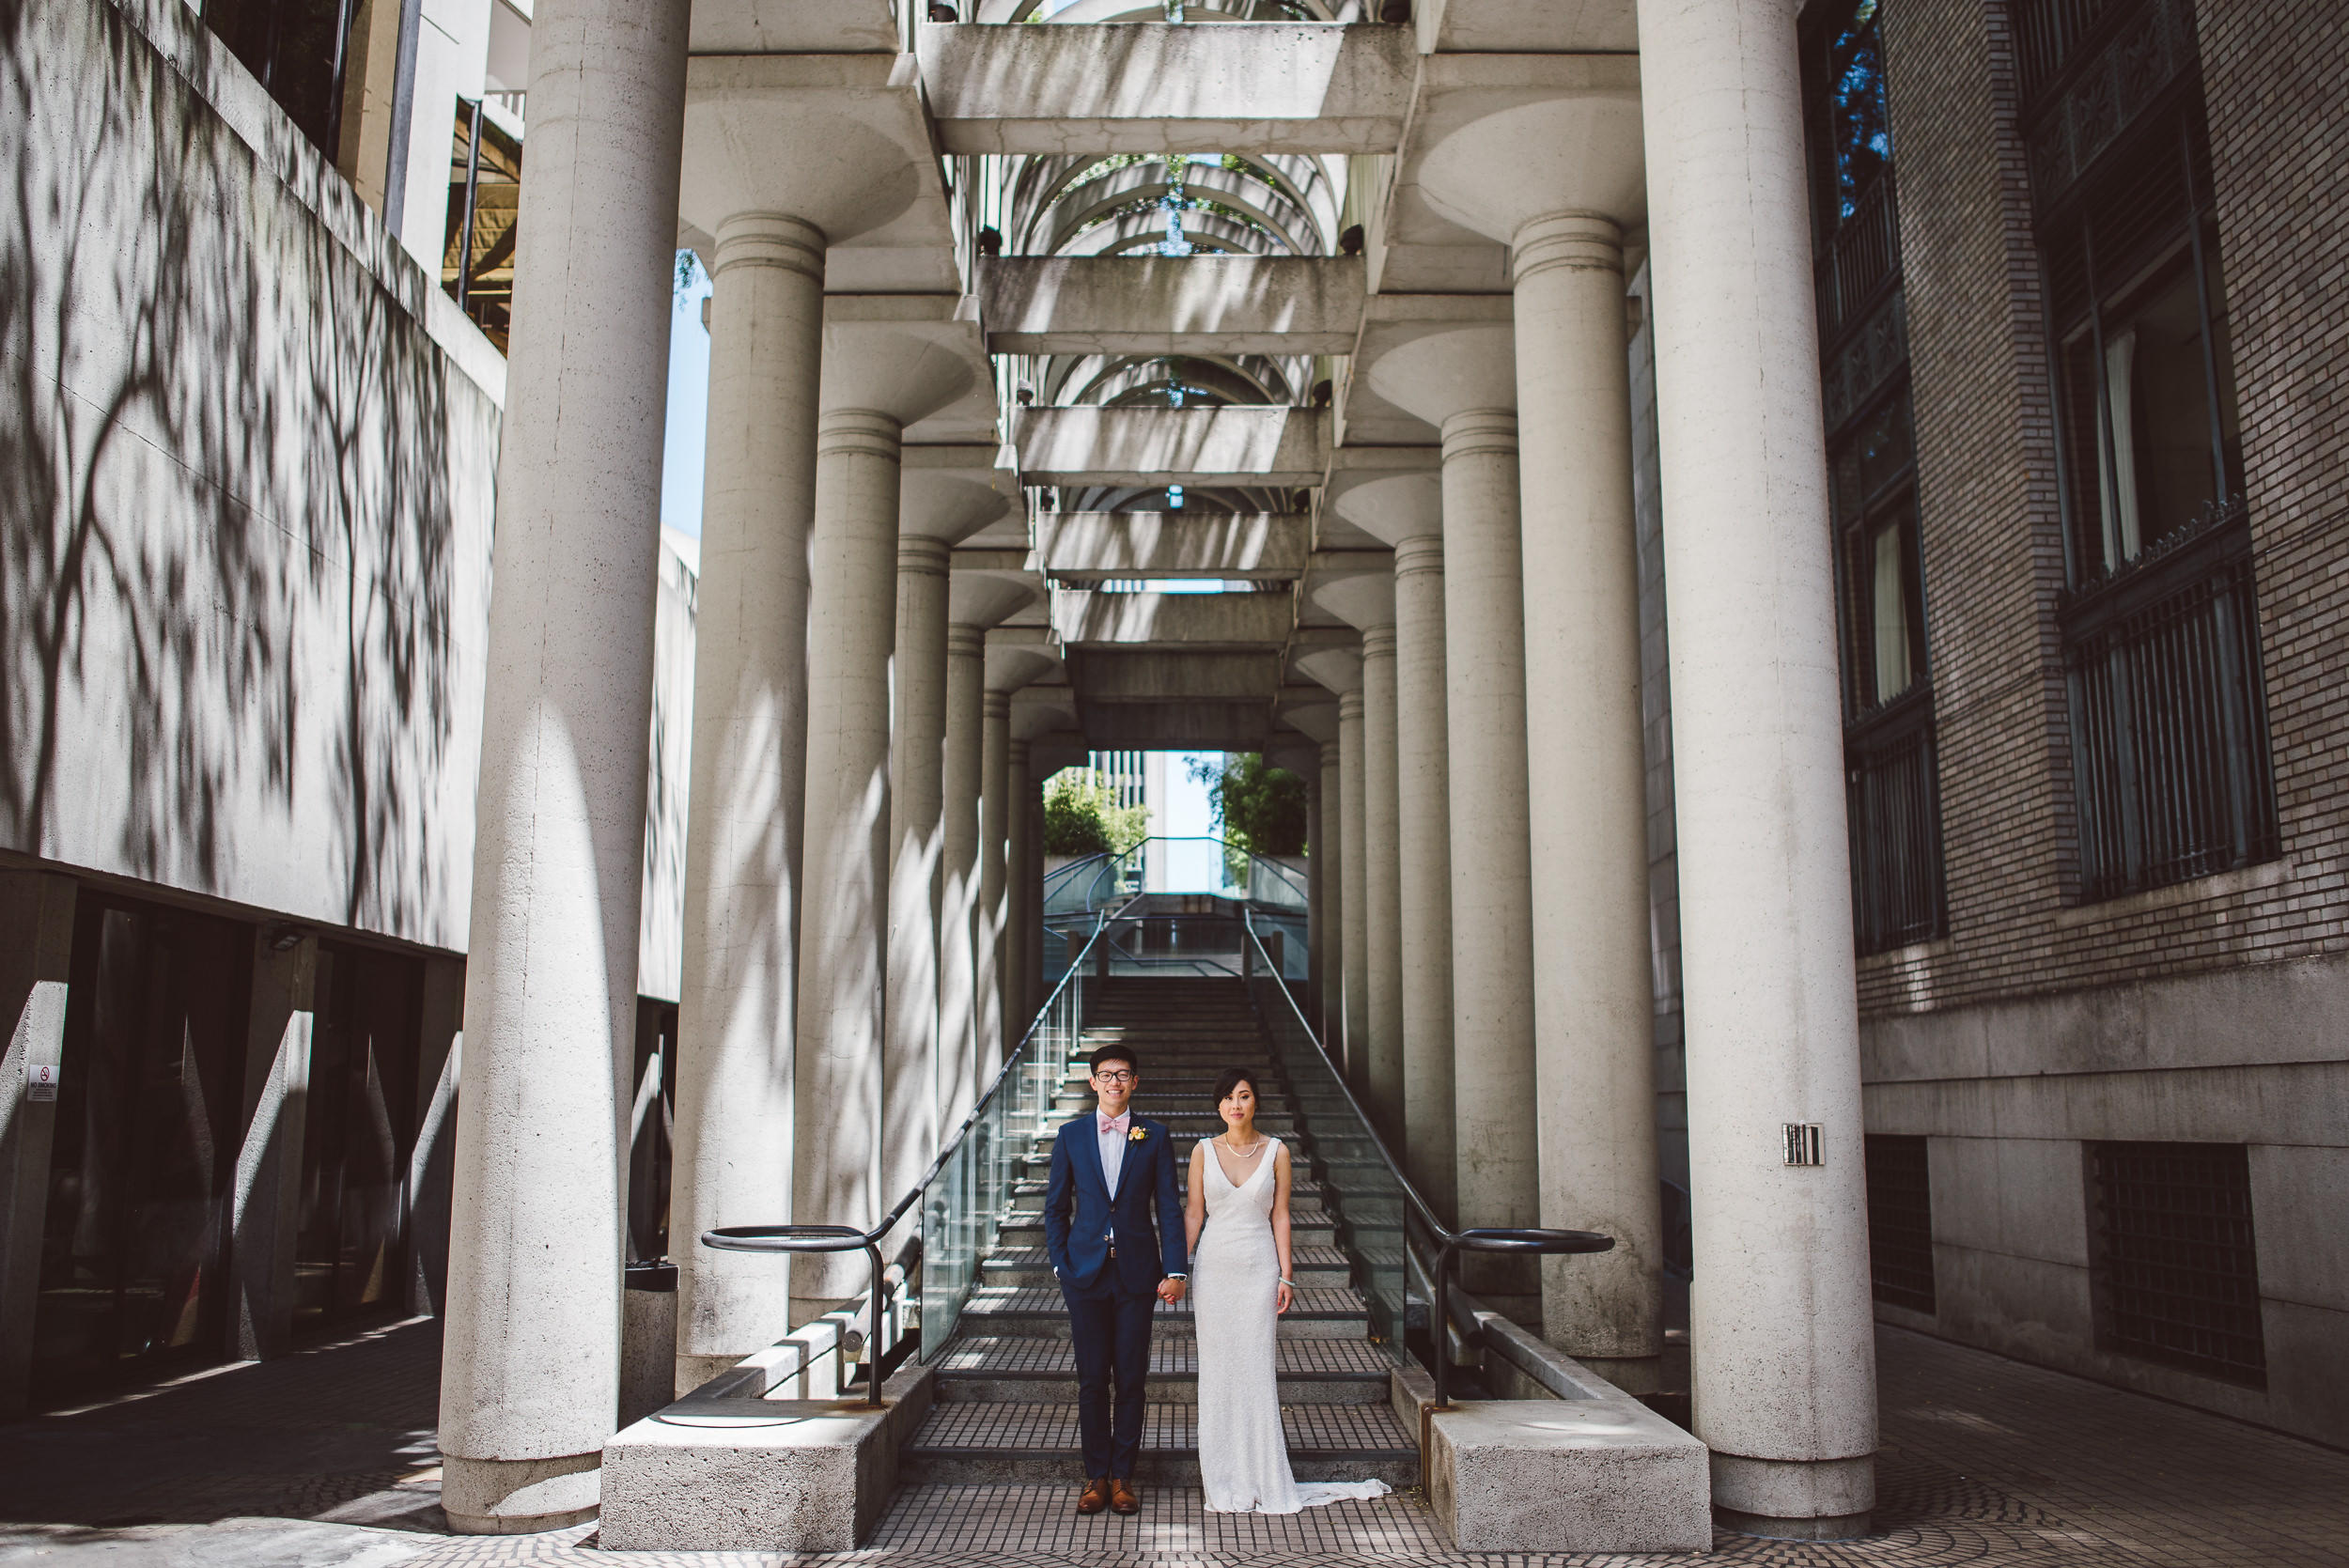 Loews-Regency-San-Francisco-Wedding-Photography-025.jpg